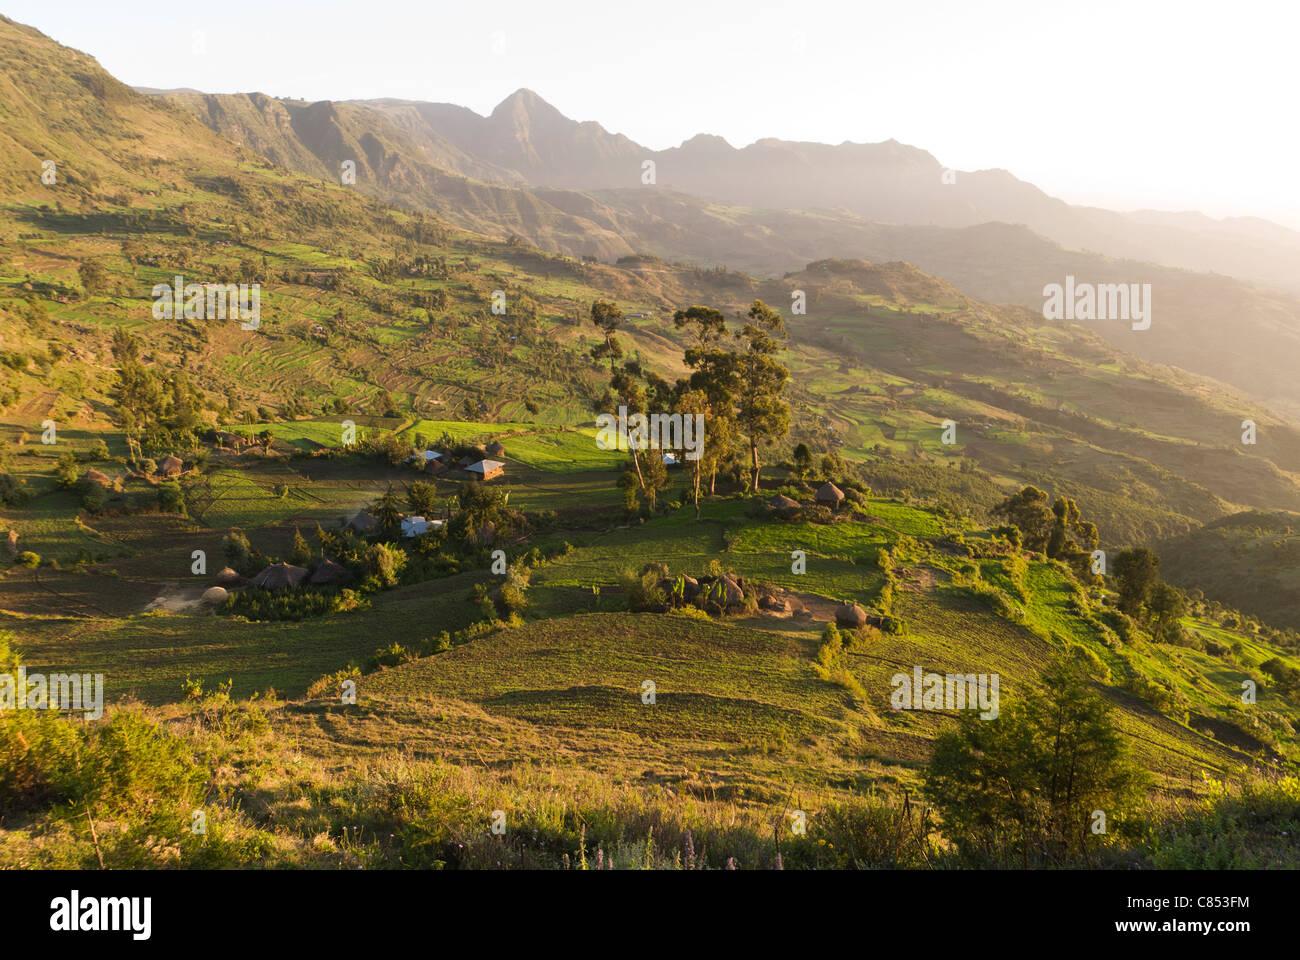 Elk200-1216 Ethiopia, Ankober, escarpment landscape - Stock Image